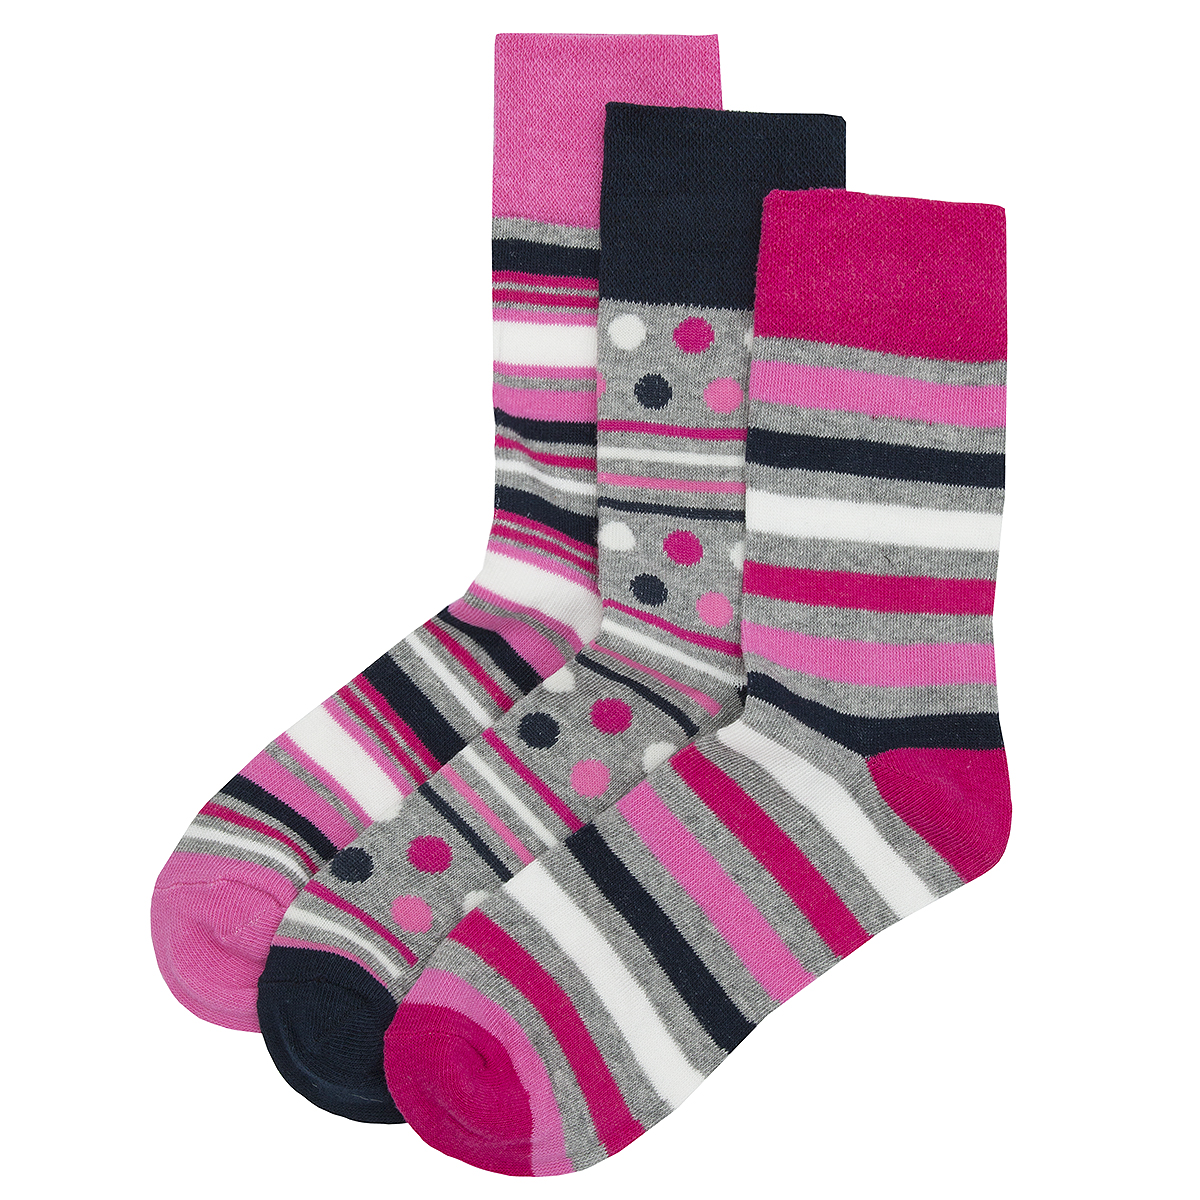 6-12-Pairs-Ladies-Womens-Non-Elastic-Loose-Top-Socks-Grip-Diabetic-Floral-New thumbnail 14